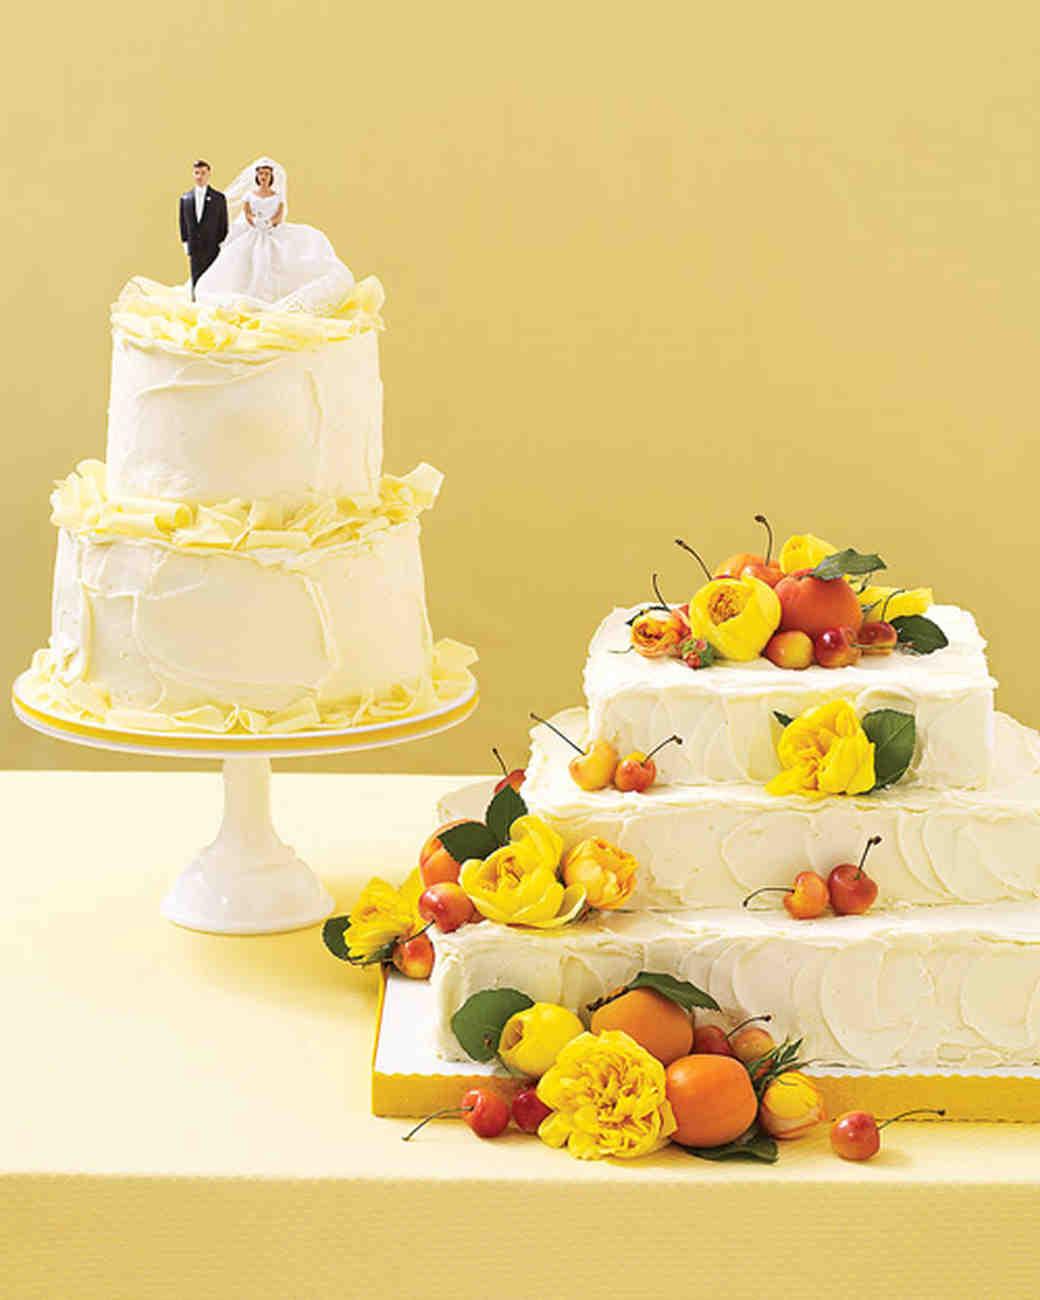 mwd104710_sum09_cakes2.jpg